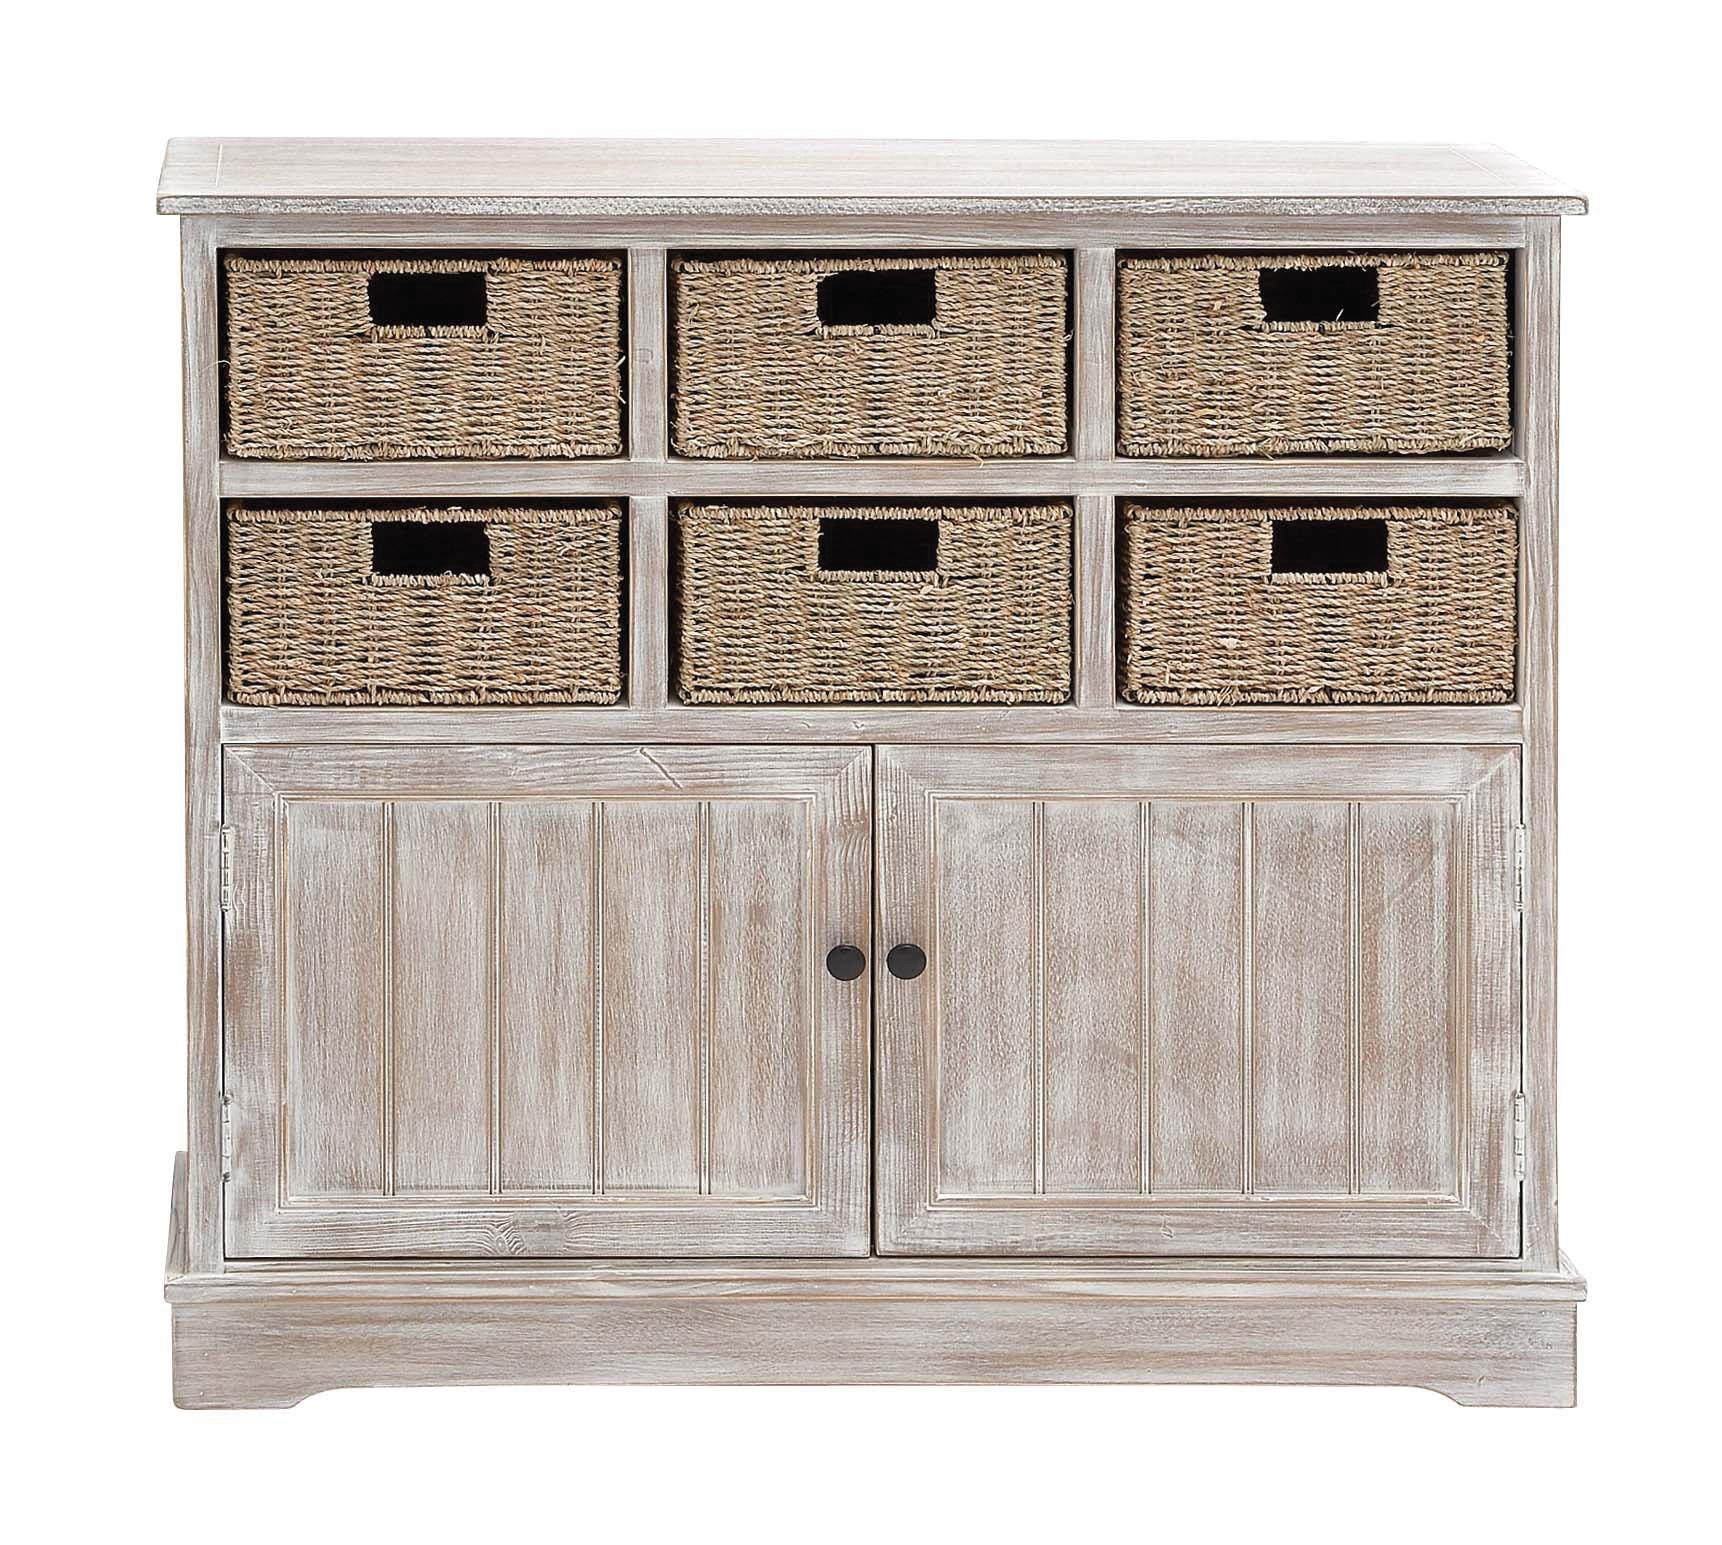 Benzara 96296 The Lovely Wood 6-Basket Cabinet